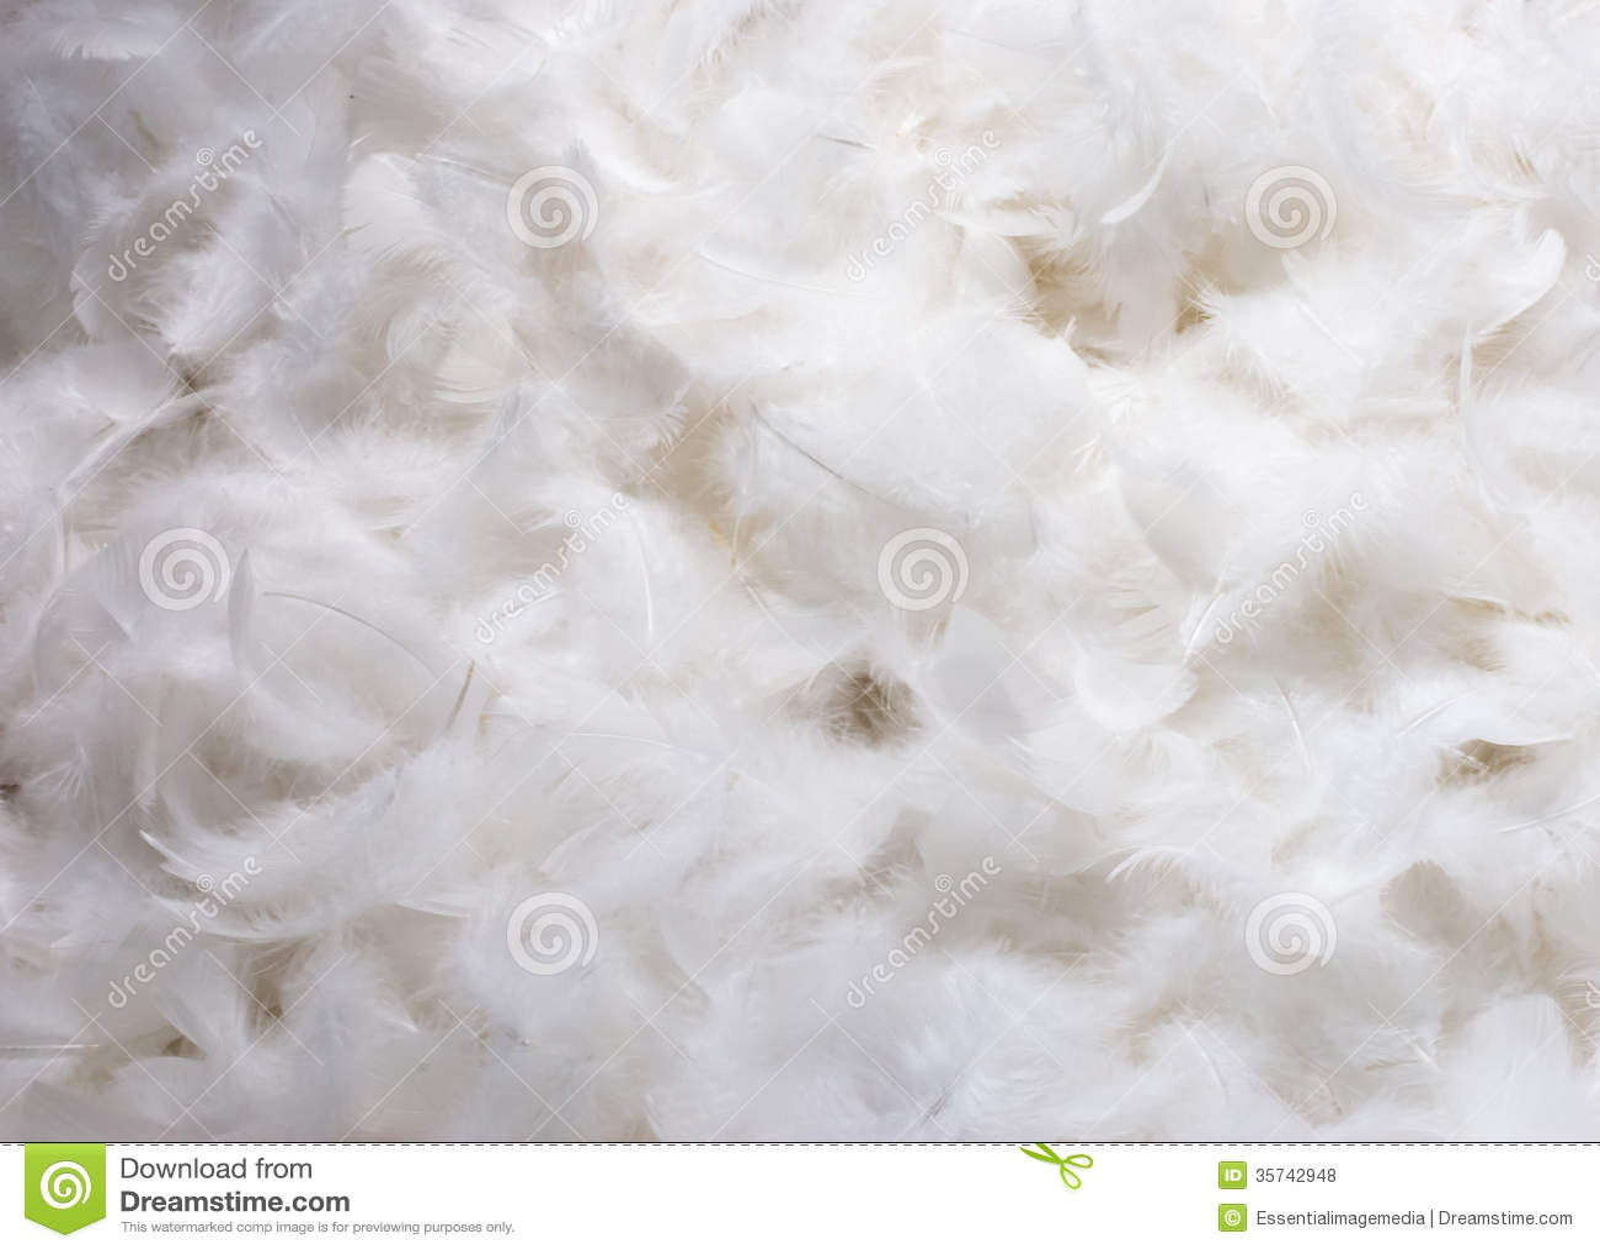 plumes blanches photos libres de droits image 35742948. Black Bedroom Furniture Sets. Home Design Ideas